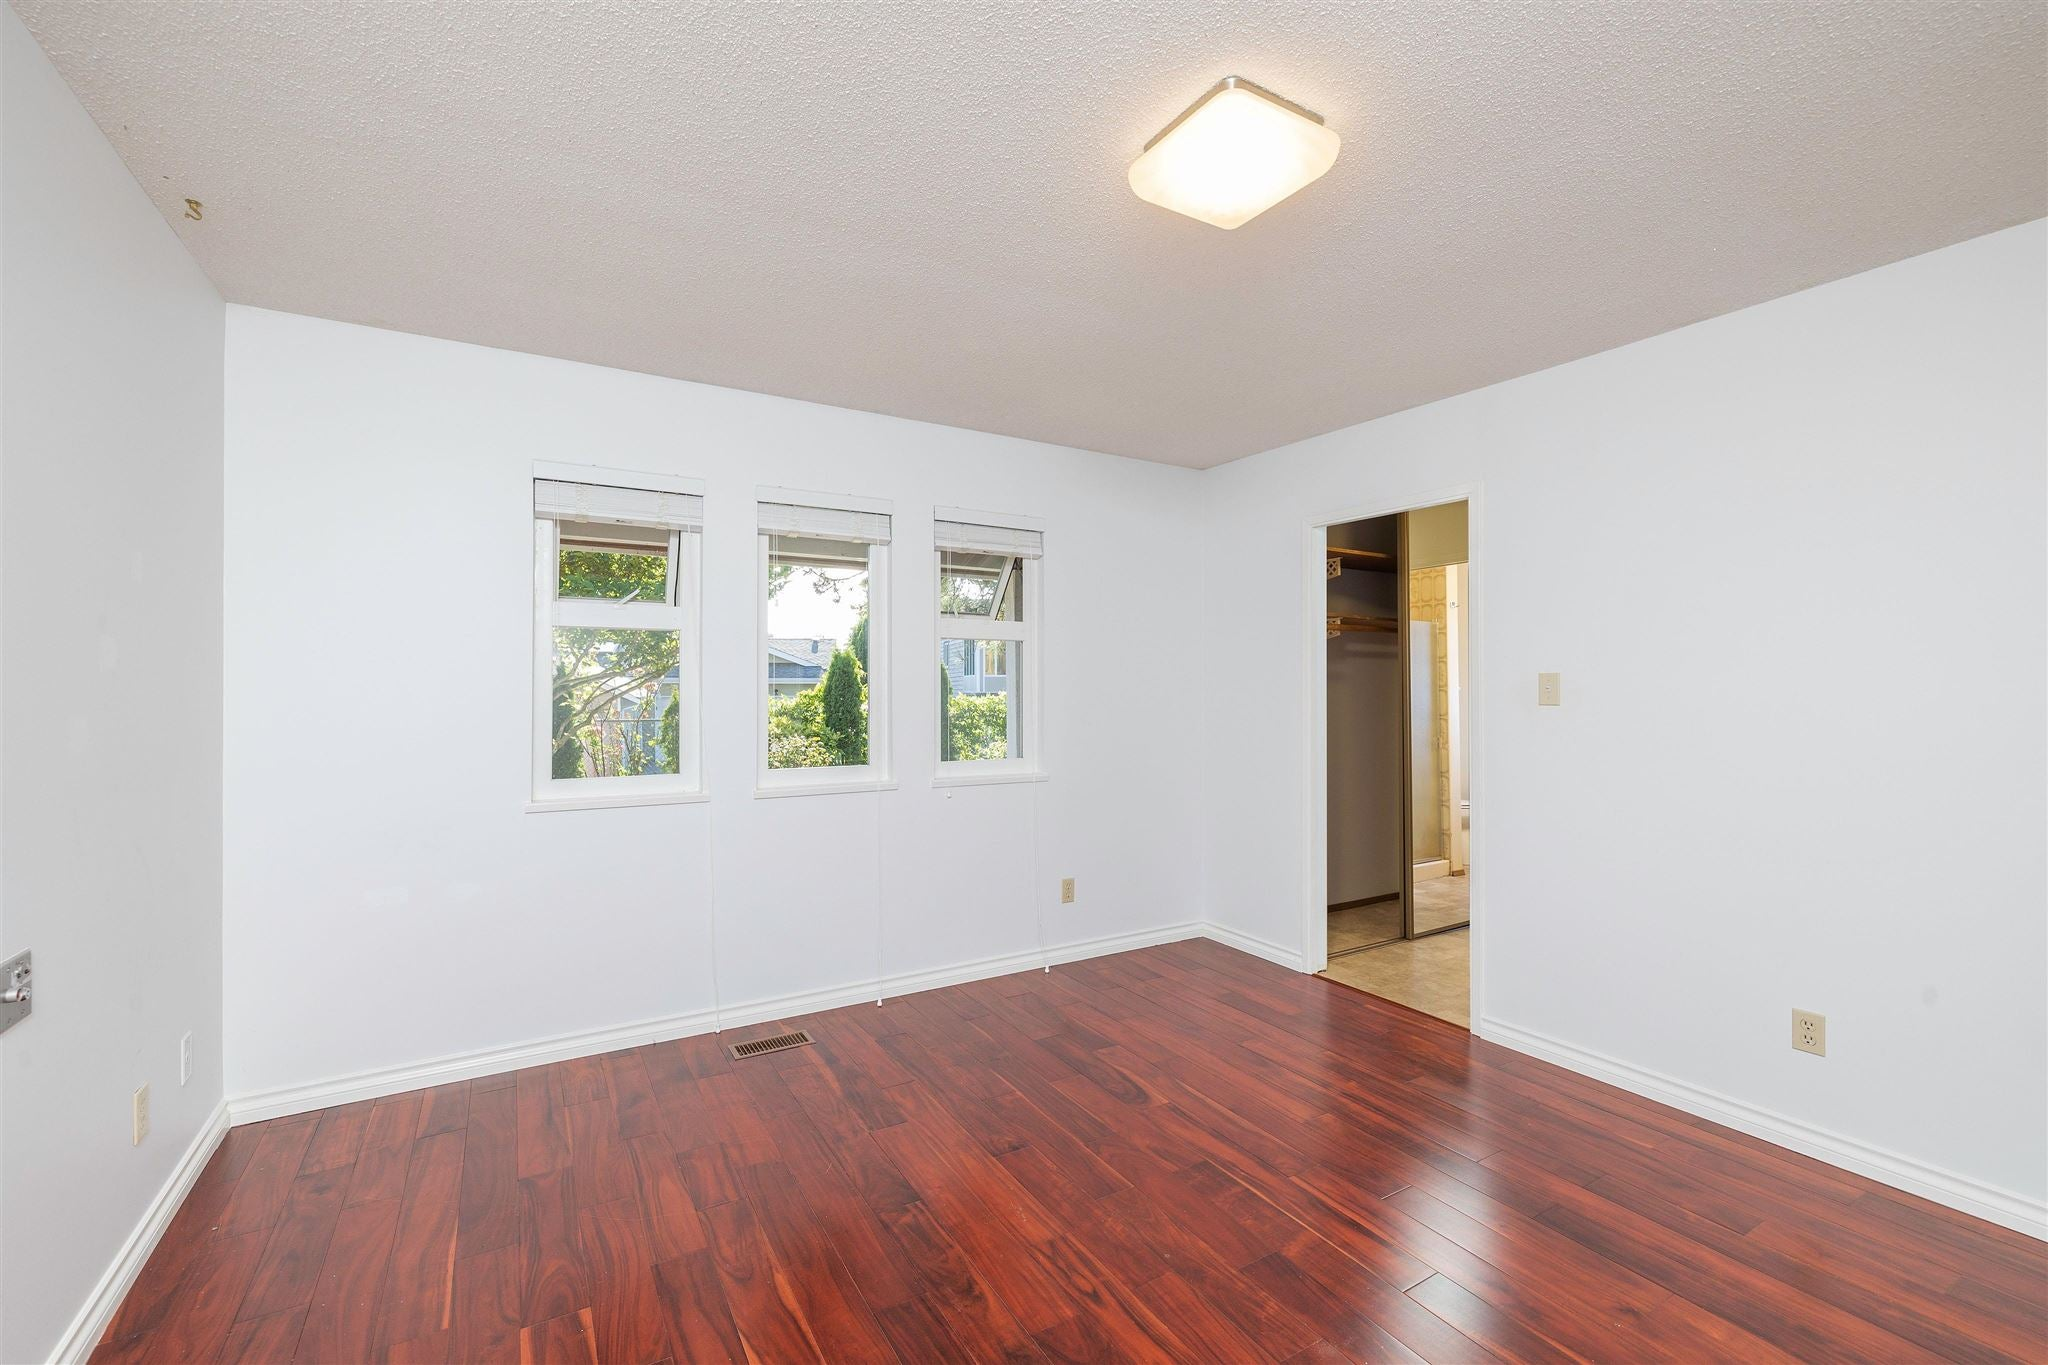 1743 148A STREET - Sunnyside Park Surrey House/Single Family for sale, 3 Bedrooms (R2604804) - #15